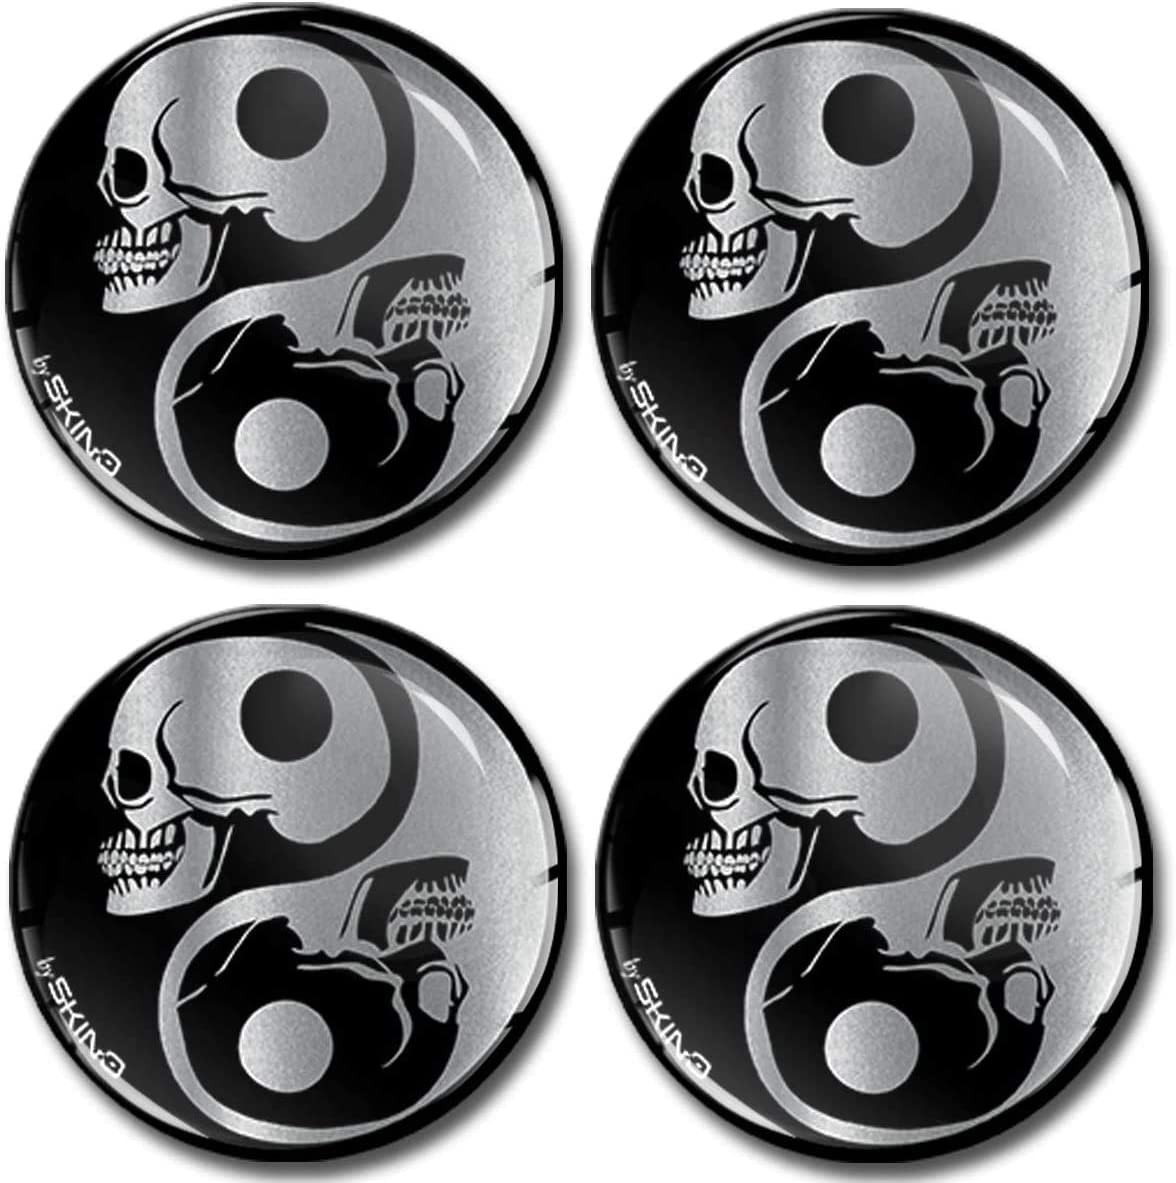 SkinoEu/® 4 x 50mm 3D Silicona Adhesivo Pegatinas Stickers Universal Tapas de Rueda de Centro Tapacubos para Coche Auto Tuning Skull Calavera Cr/áneo Yin Yang S/ímbolo Plata A 8250